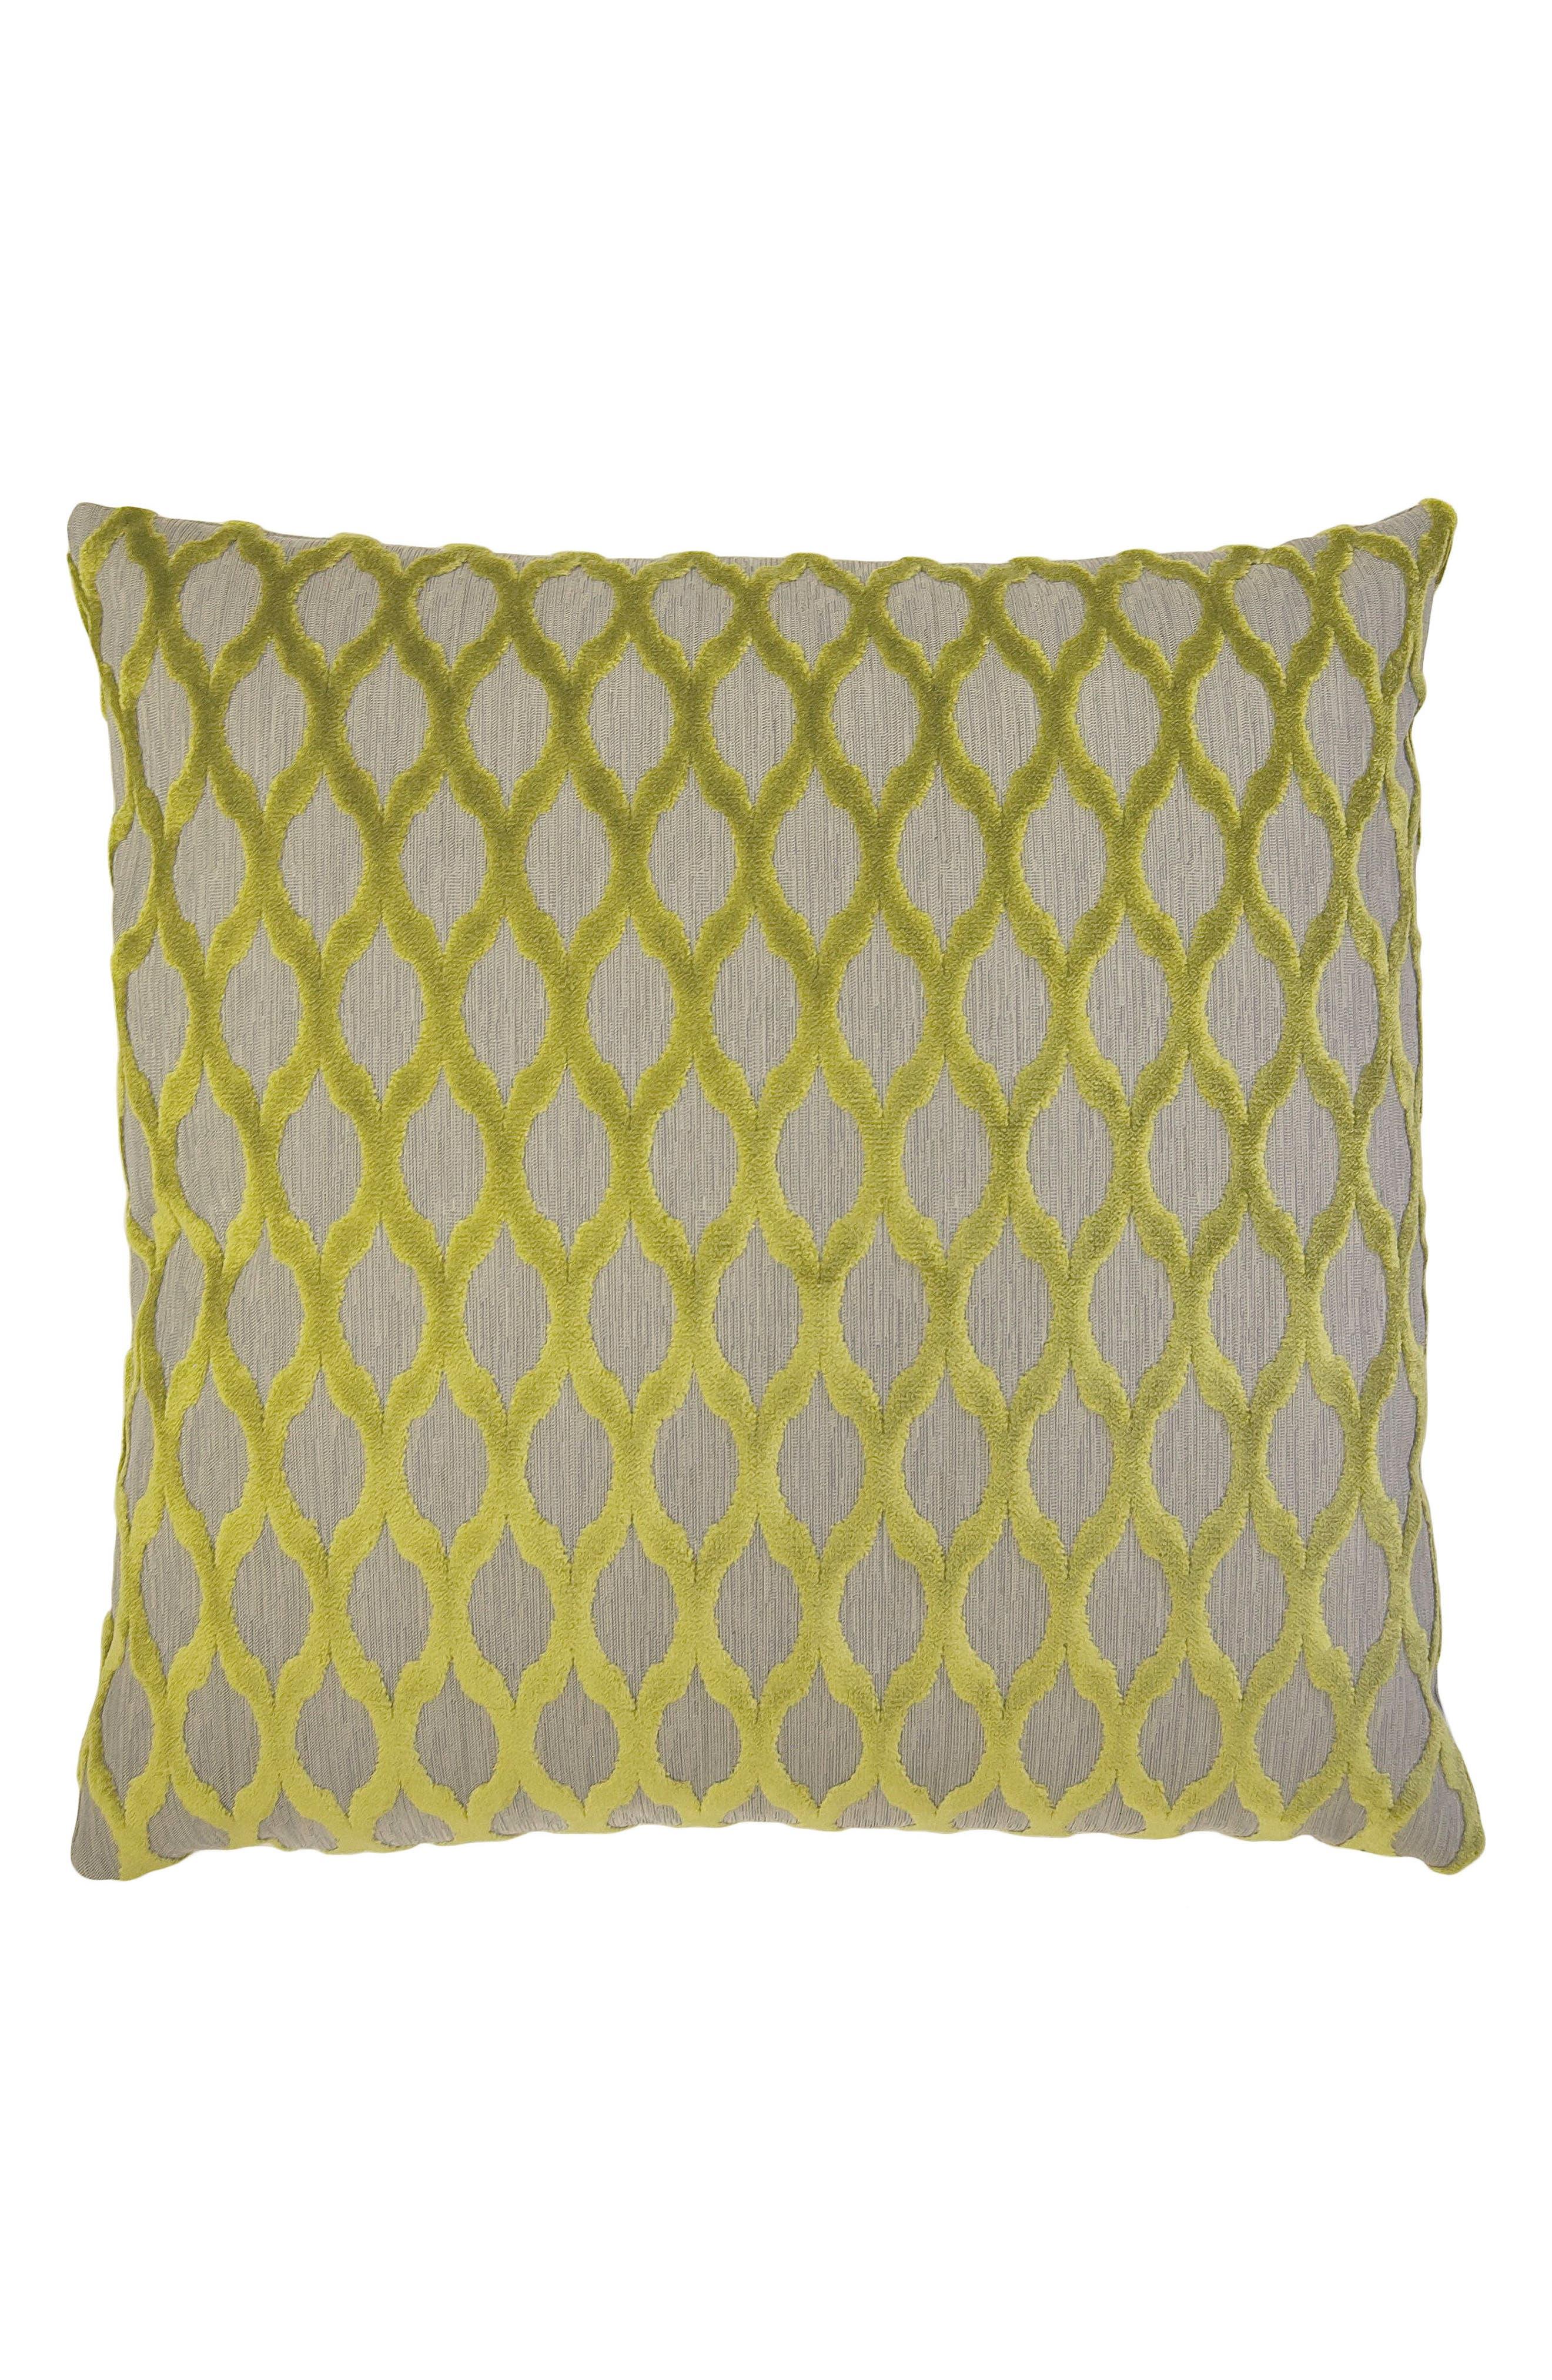 Lattice Accent Pillow,                             Main thumbnail 1, color,                             GREEN